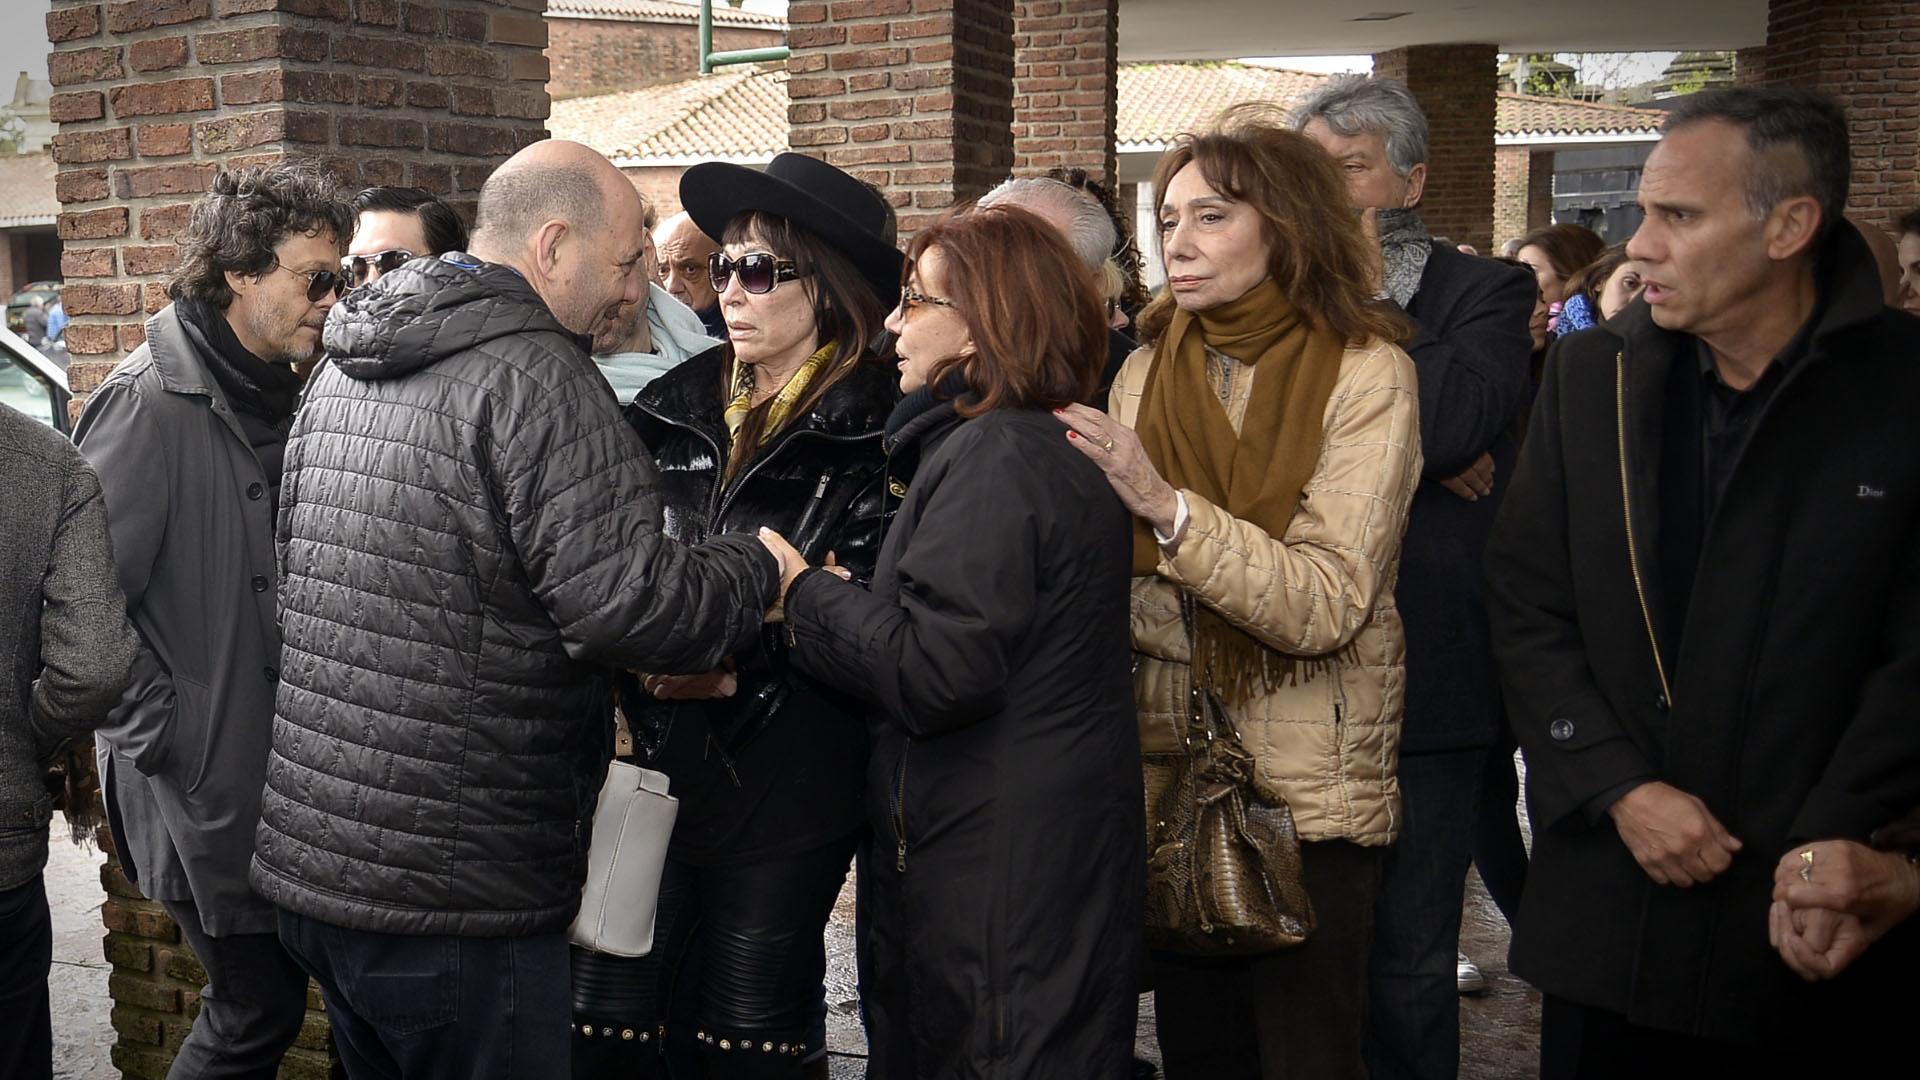 Carlos Rotemberg, Moria Casán, Nora Cárpena y Marta Bianchi